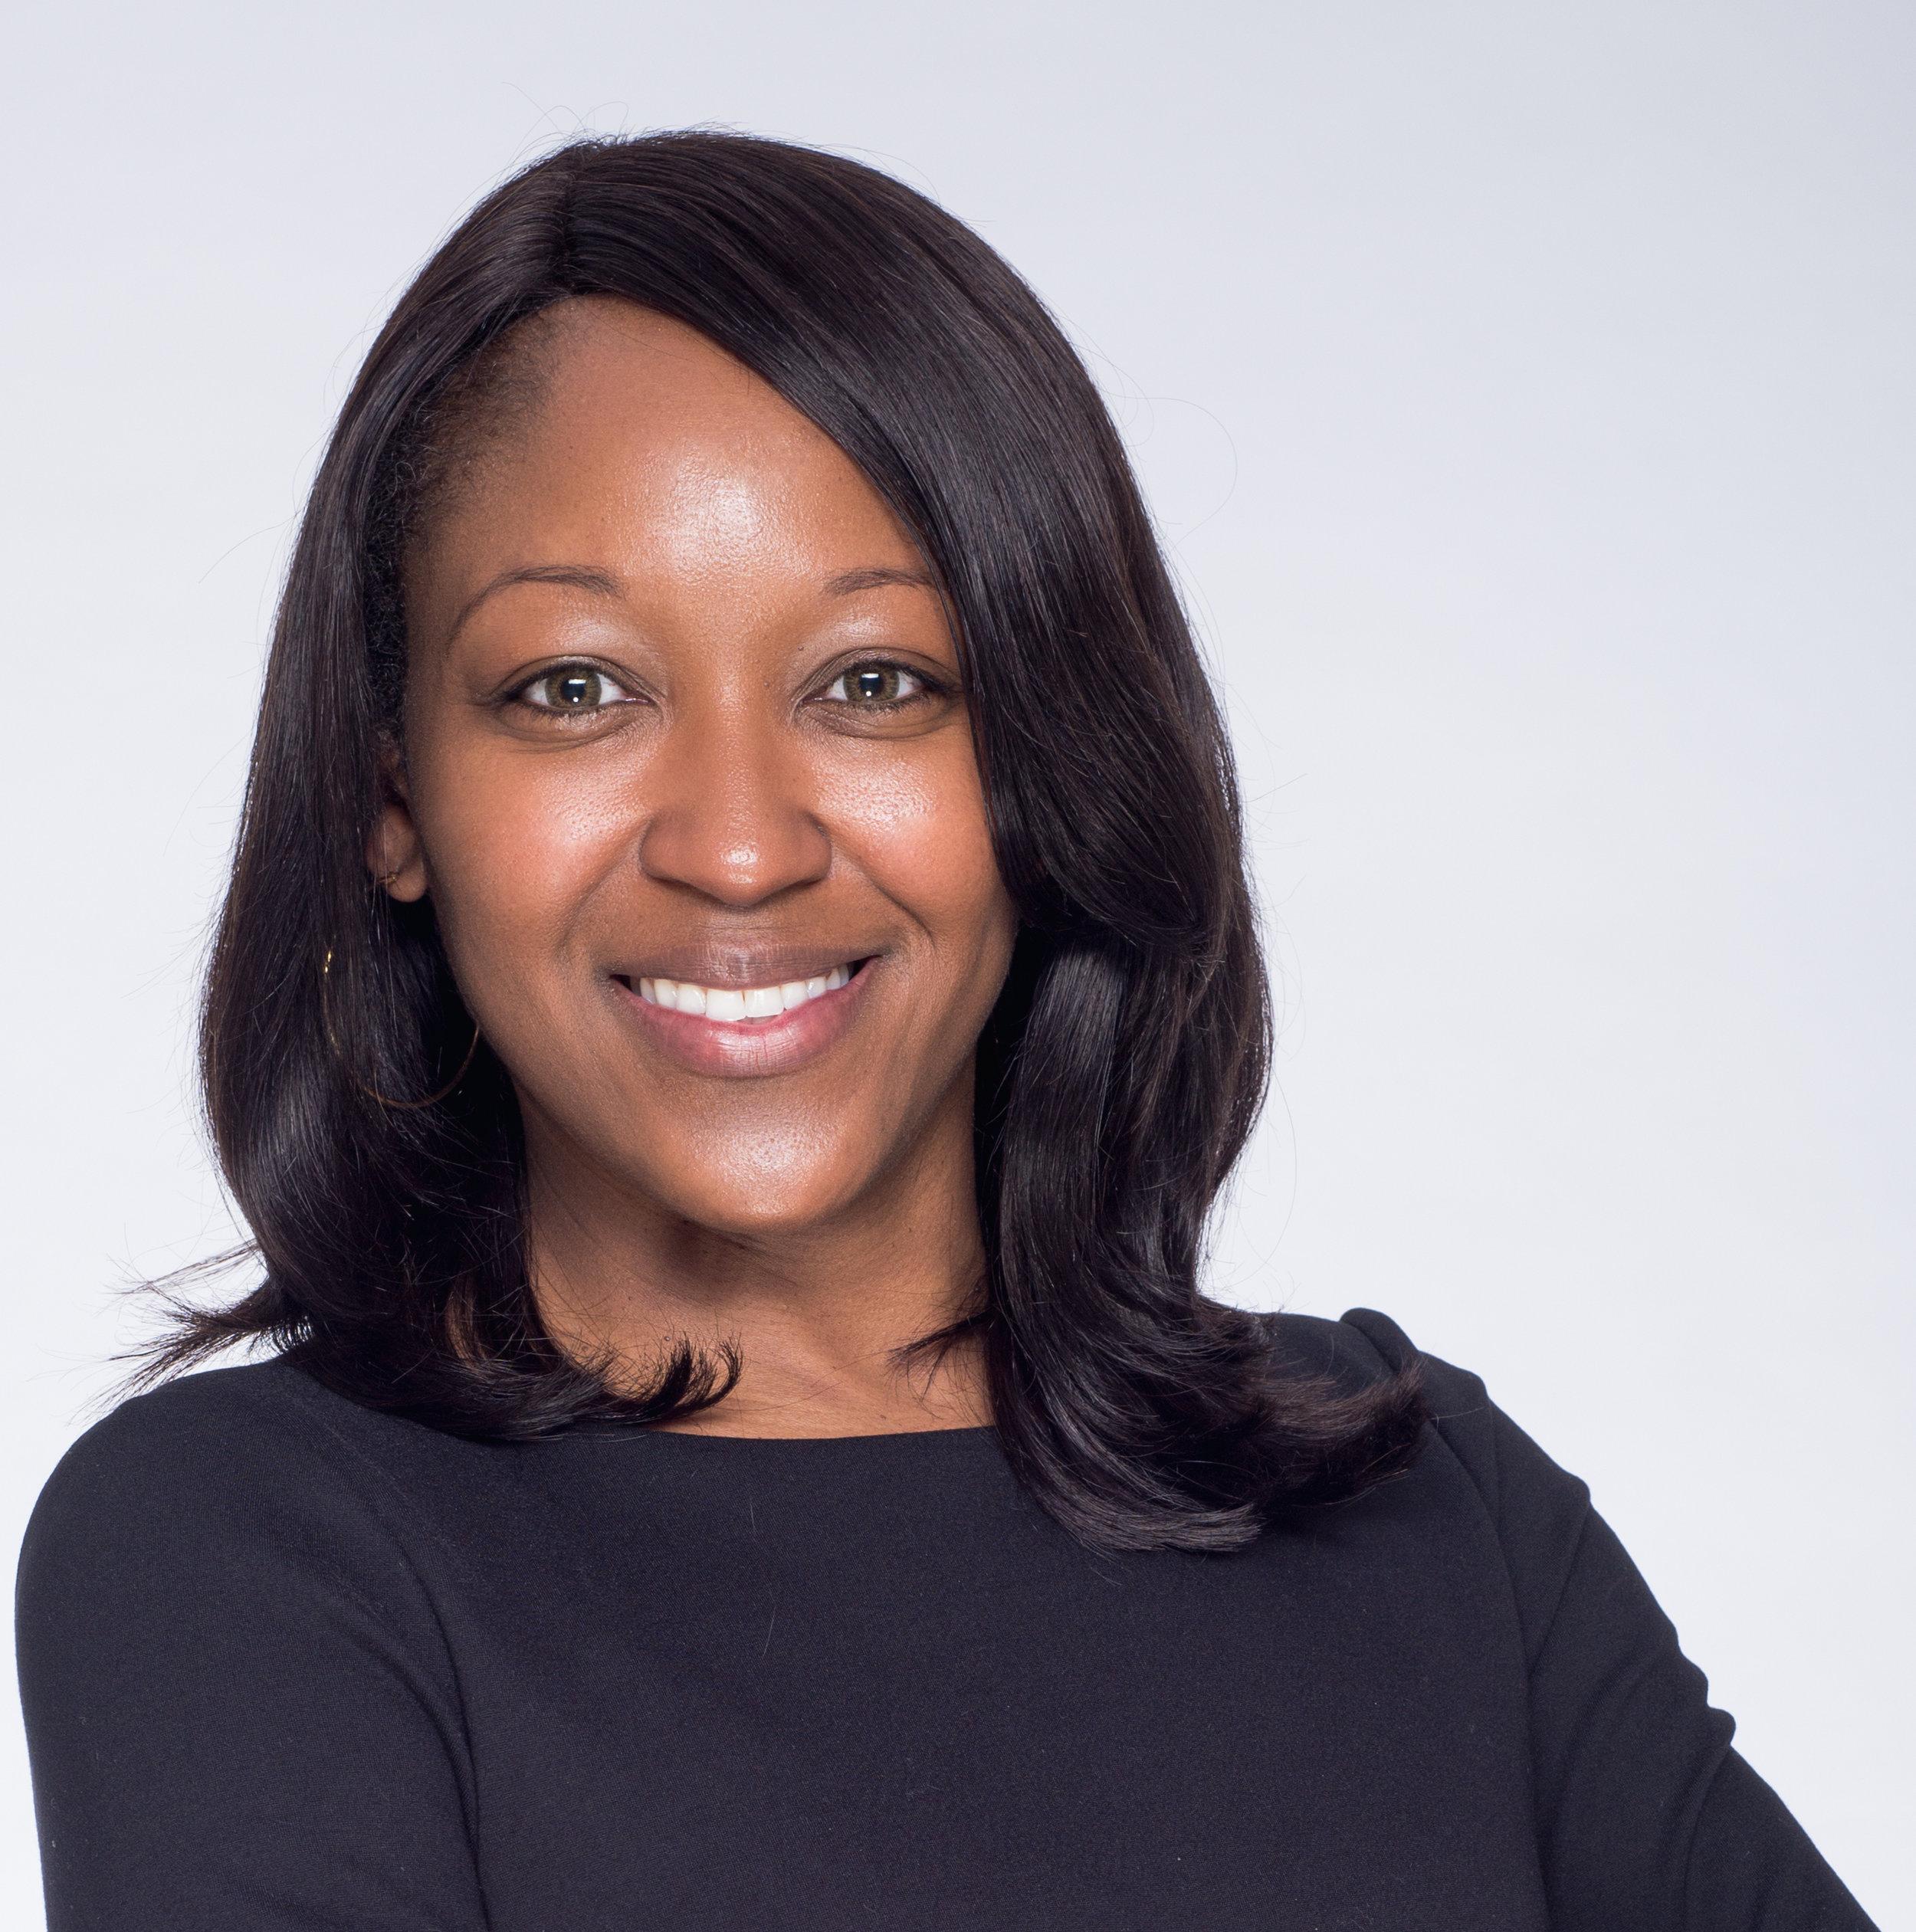 Toya D. Everett - Vice President, Risk Management and Community Engagement